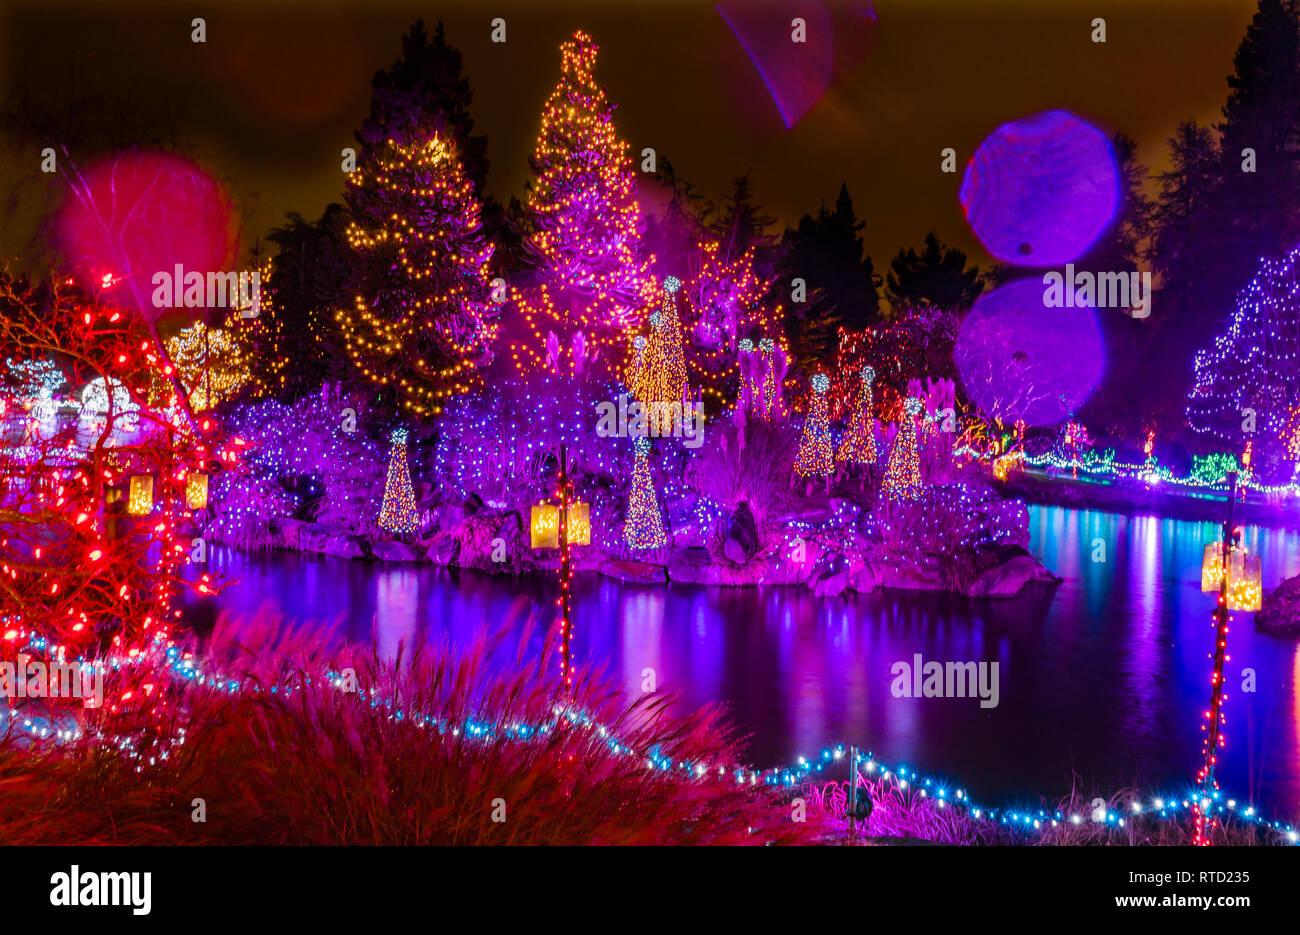 Pink Purple Blue Christmas Trees Lights Reflection Lake Van Dusen